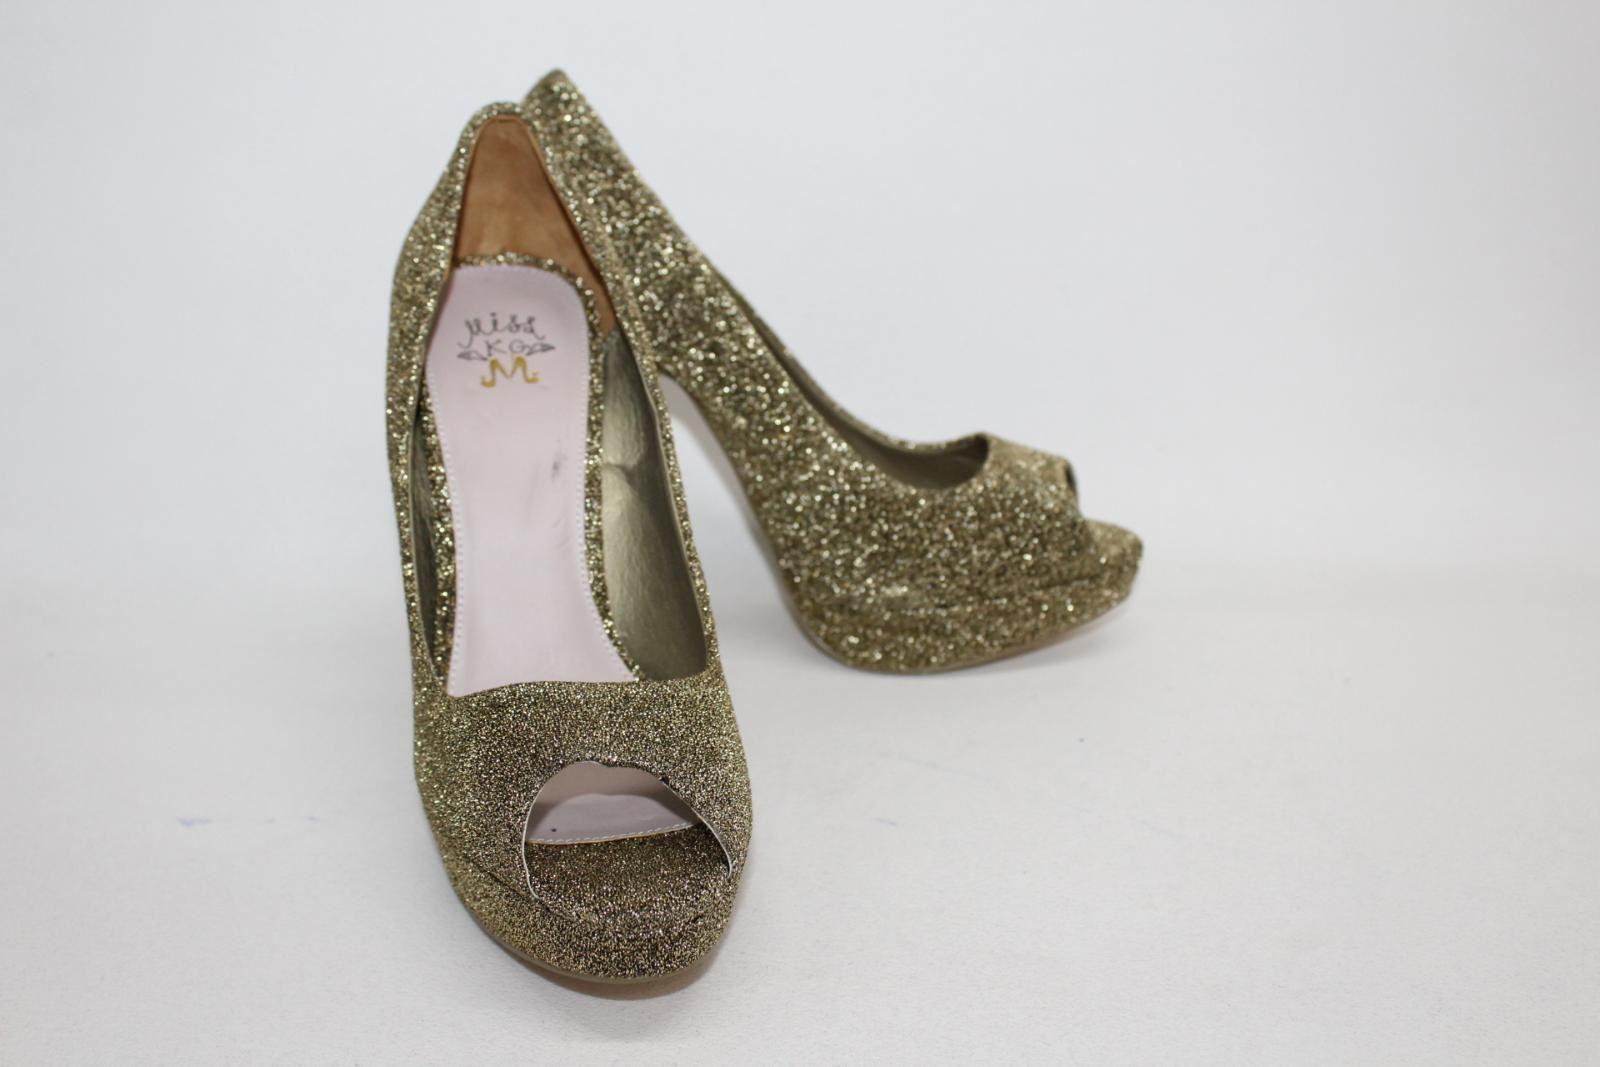 MISS KG Ladies gold Glitter Peep Toes Platform Heel shoes Size Approx. UK7